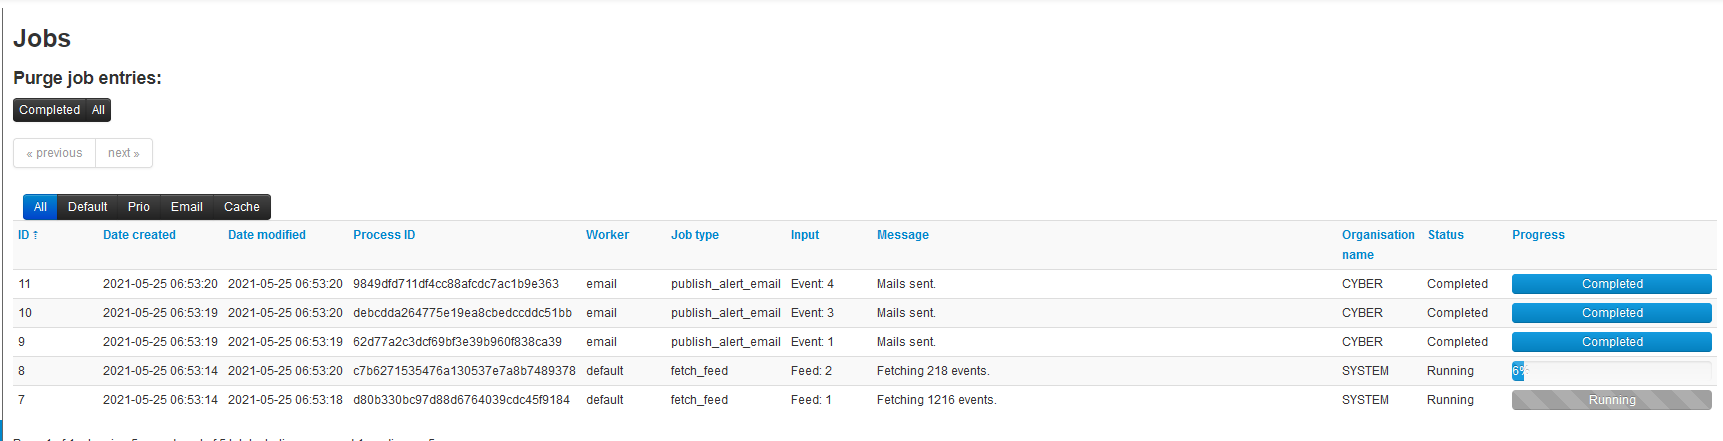 Misp_jobs